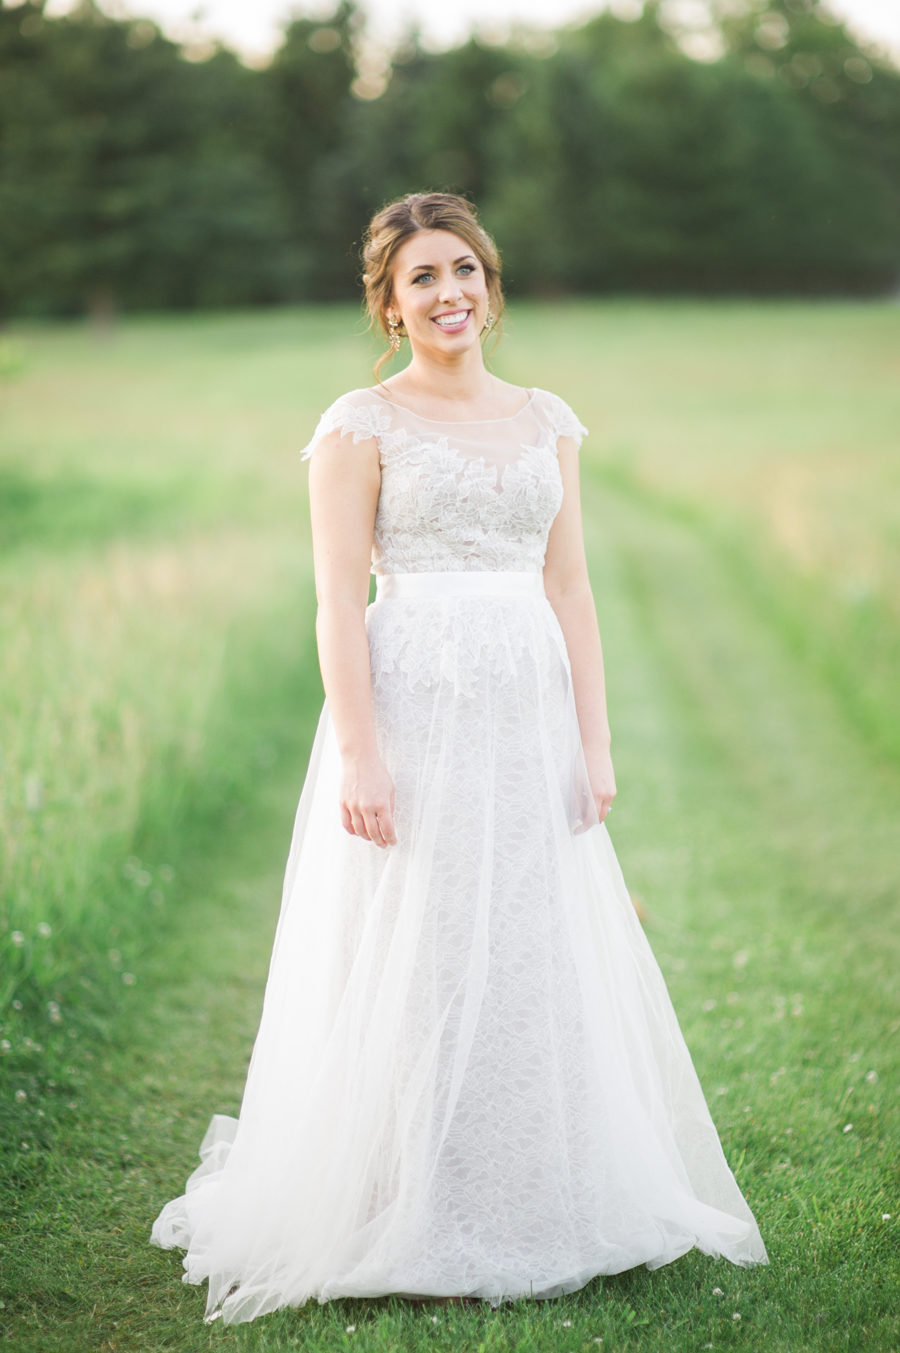 Thrift Store Wedding Dresses 16 Fabulous